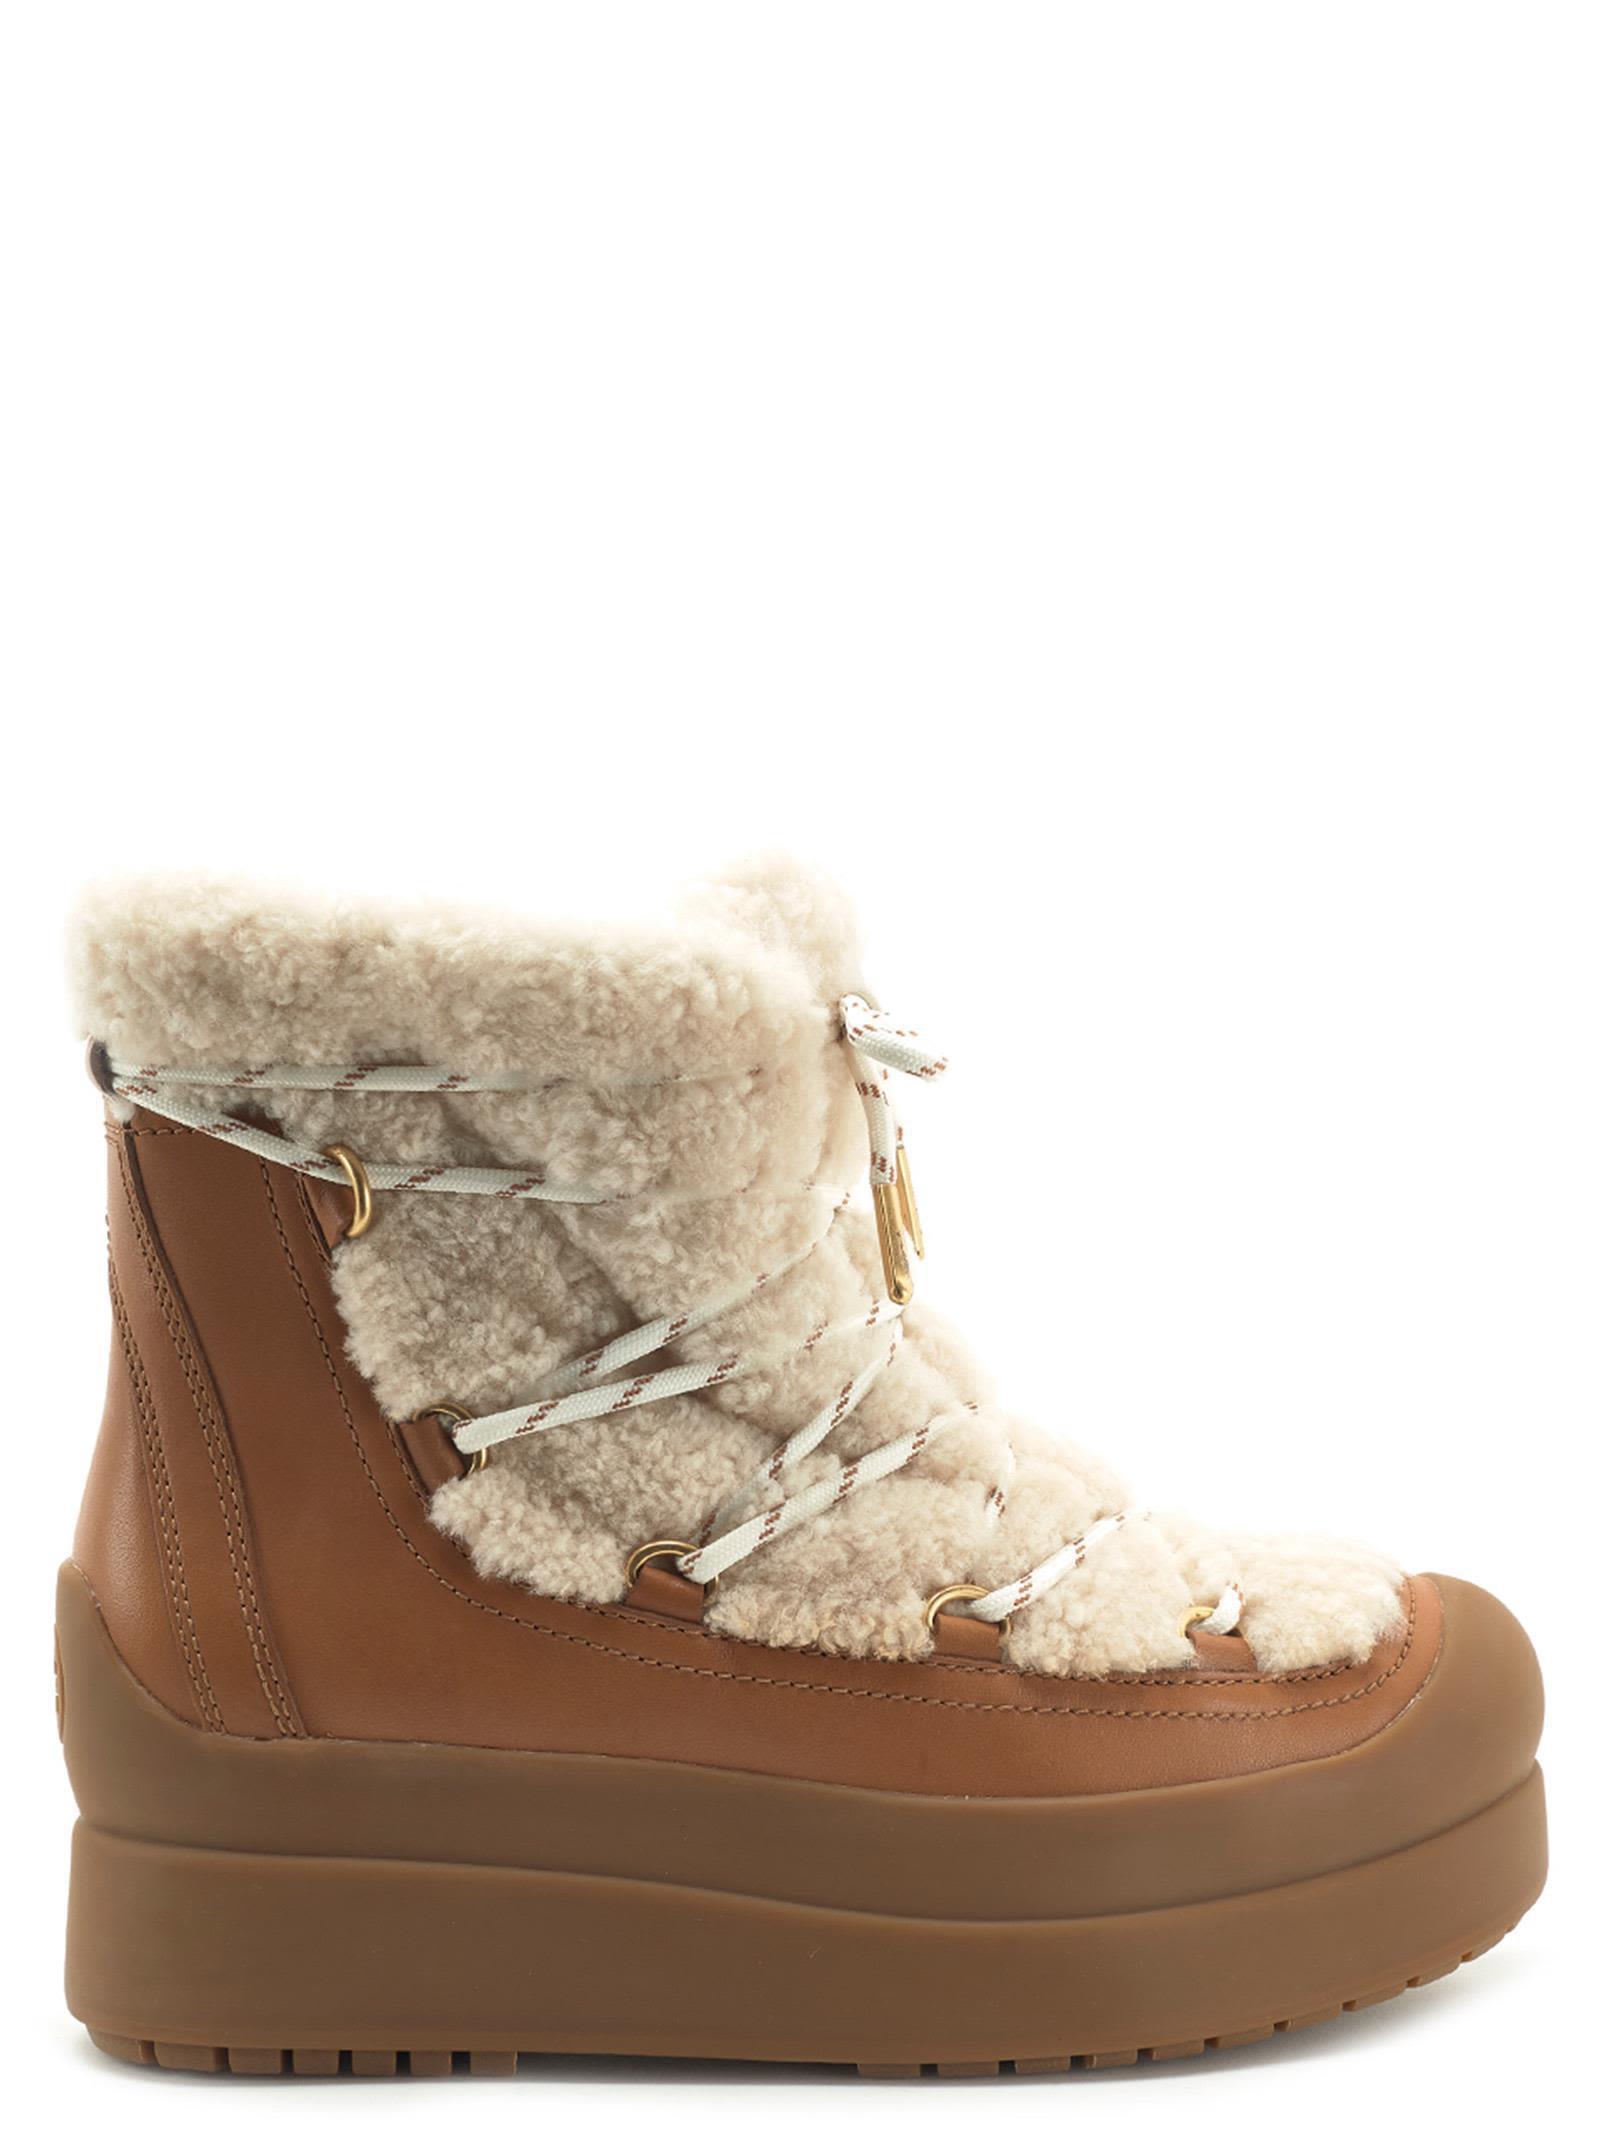 Tory Burch Shoes In Beige